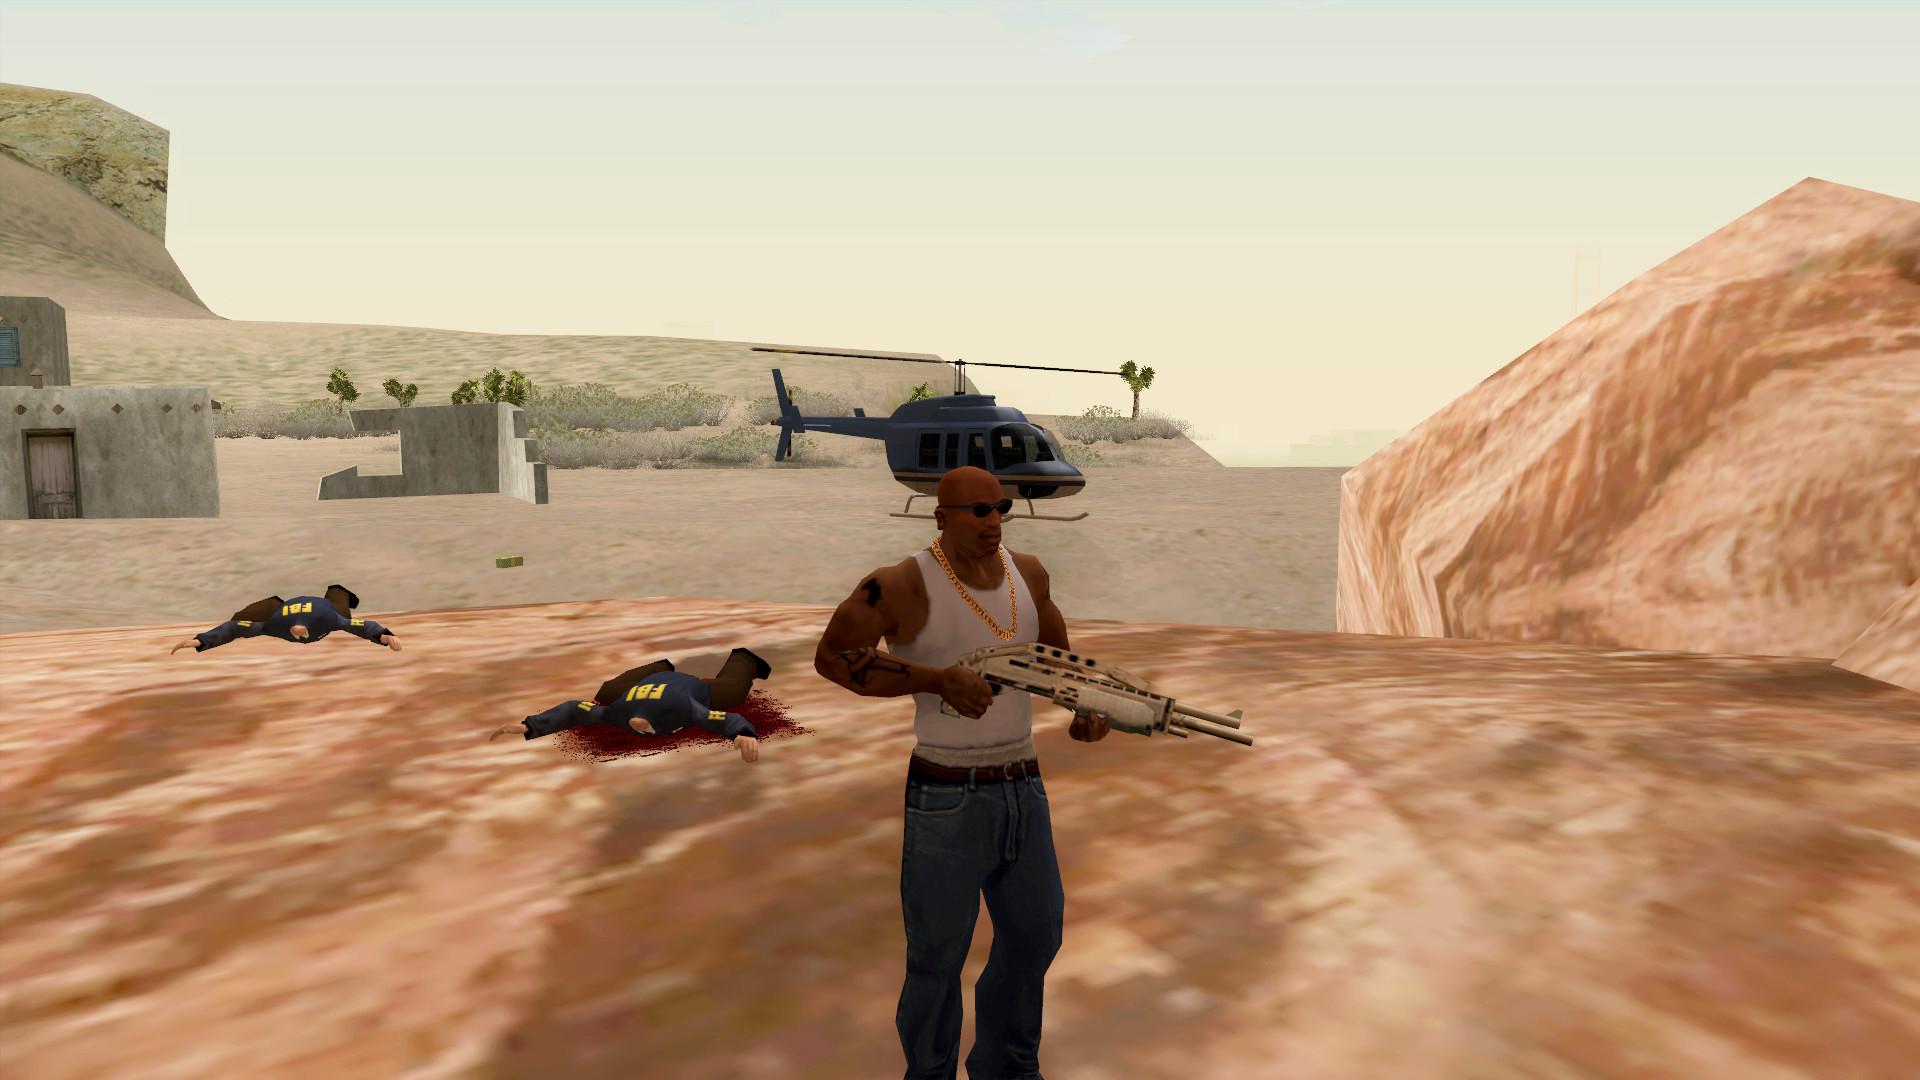 gta_sa 2016-05-17 21-13-25-97.jpg - Grand Theft Auto: San Andreas